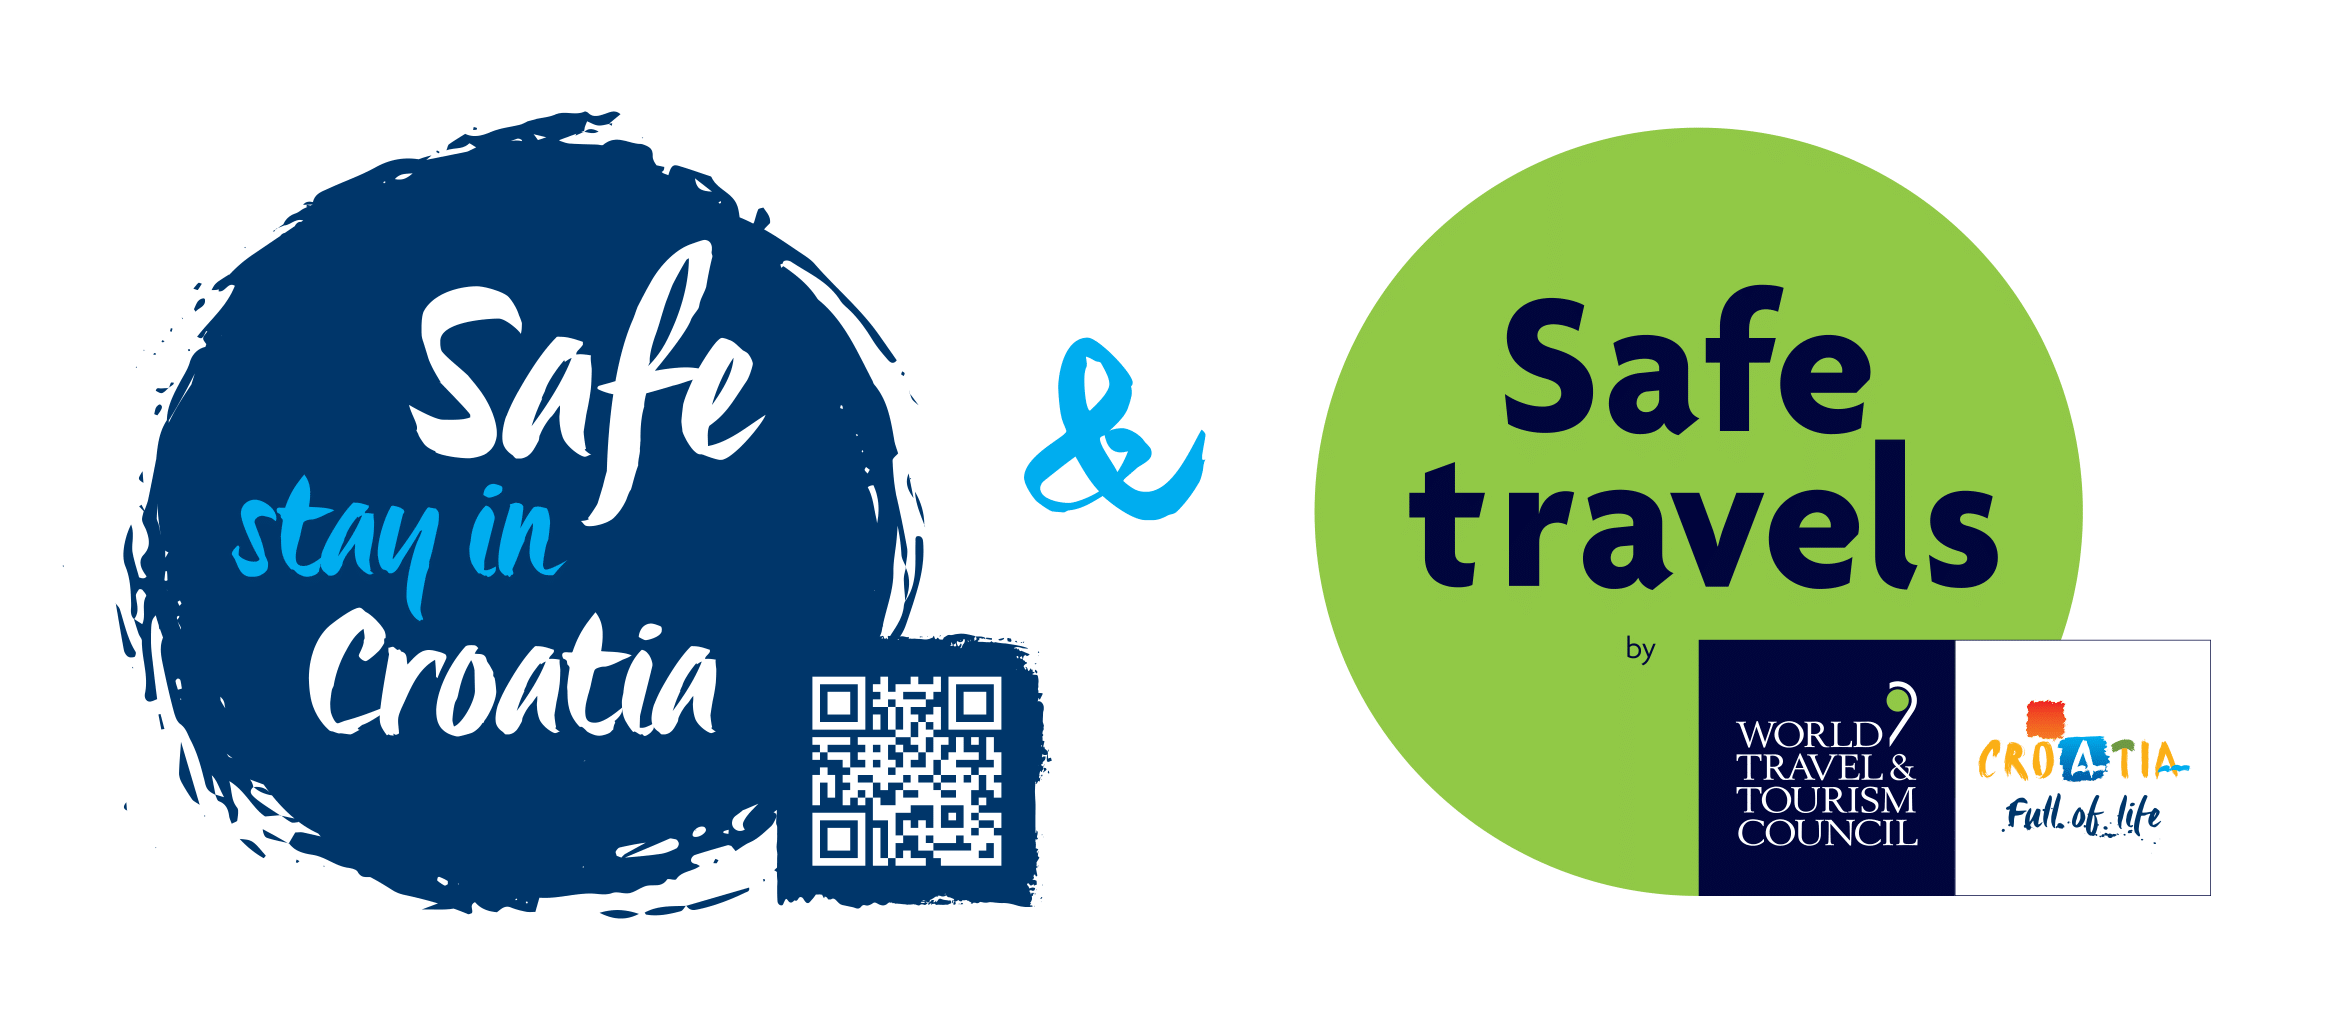 Saty safe